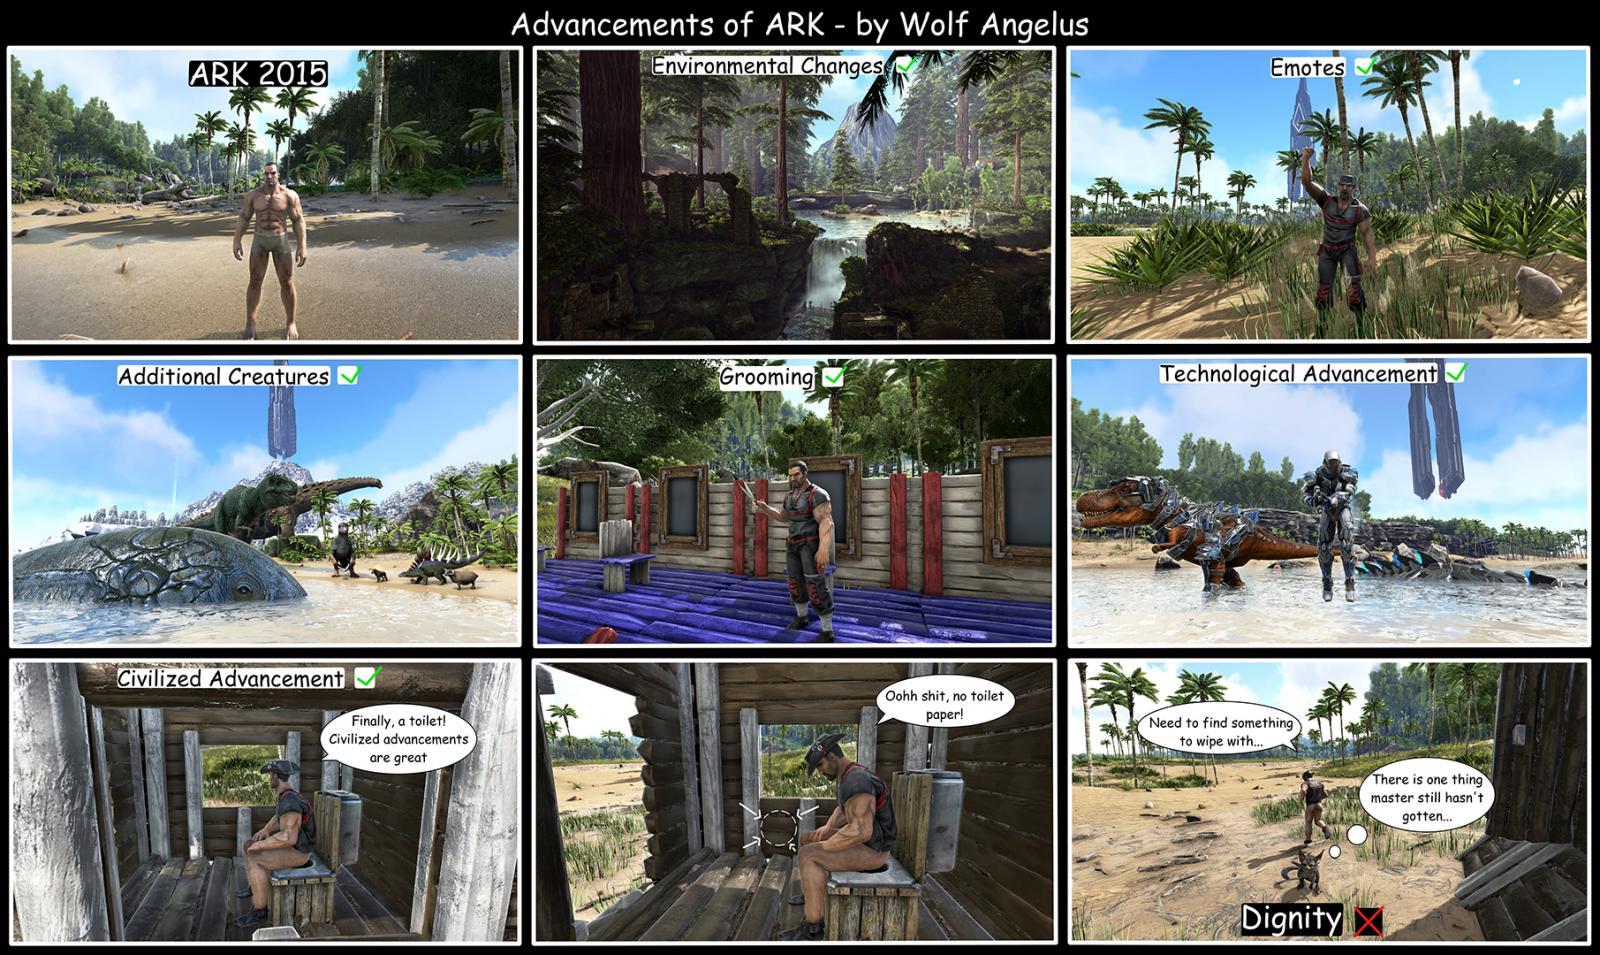 large.5944ac9003fab_WolfAngelus-AdvancementsofARK-TributetoARKComicStrip-Freeform.jpg